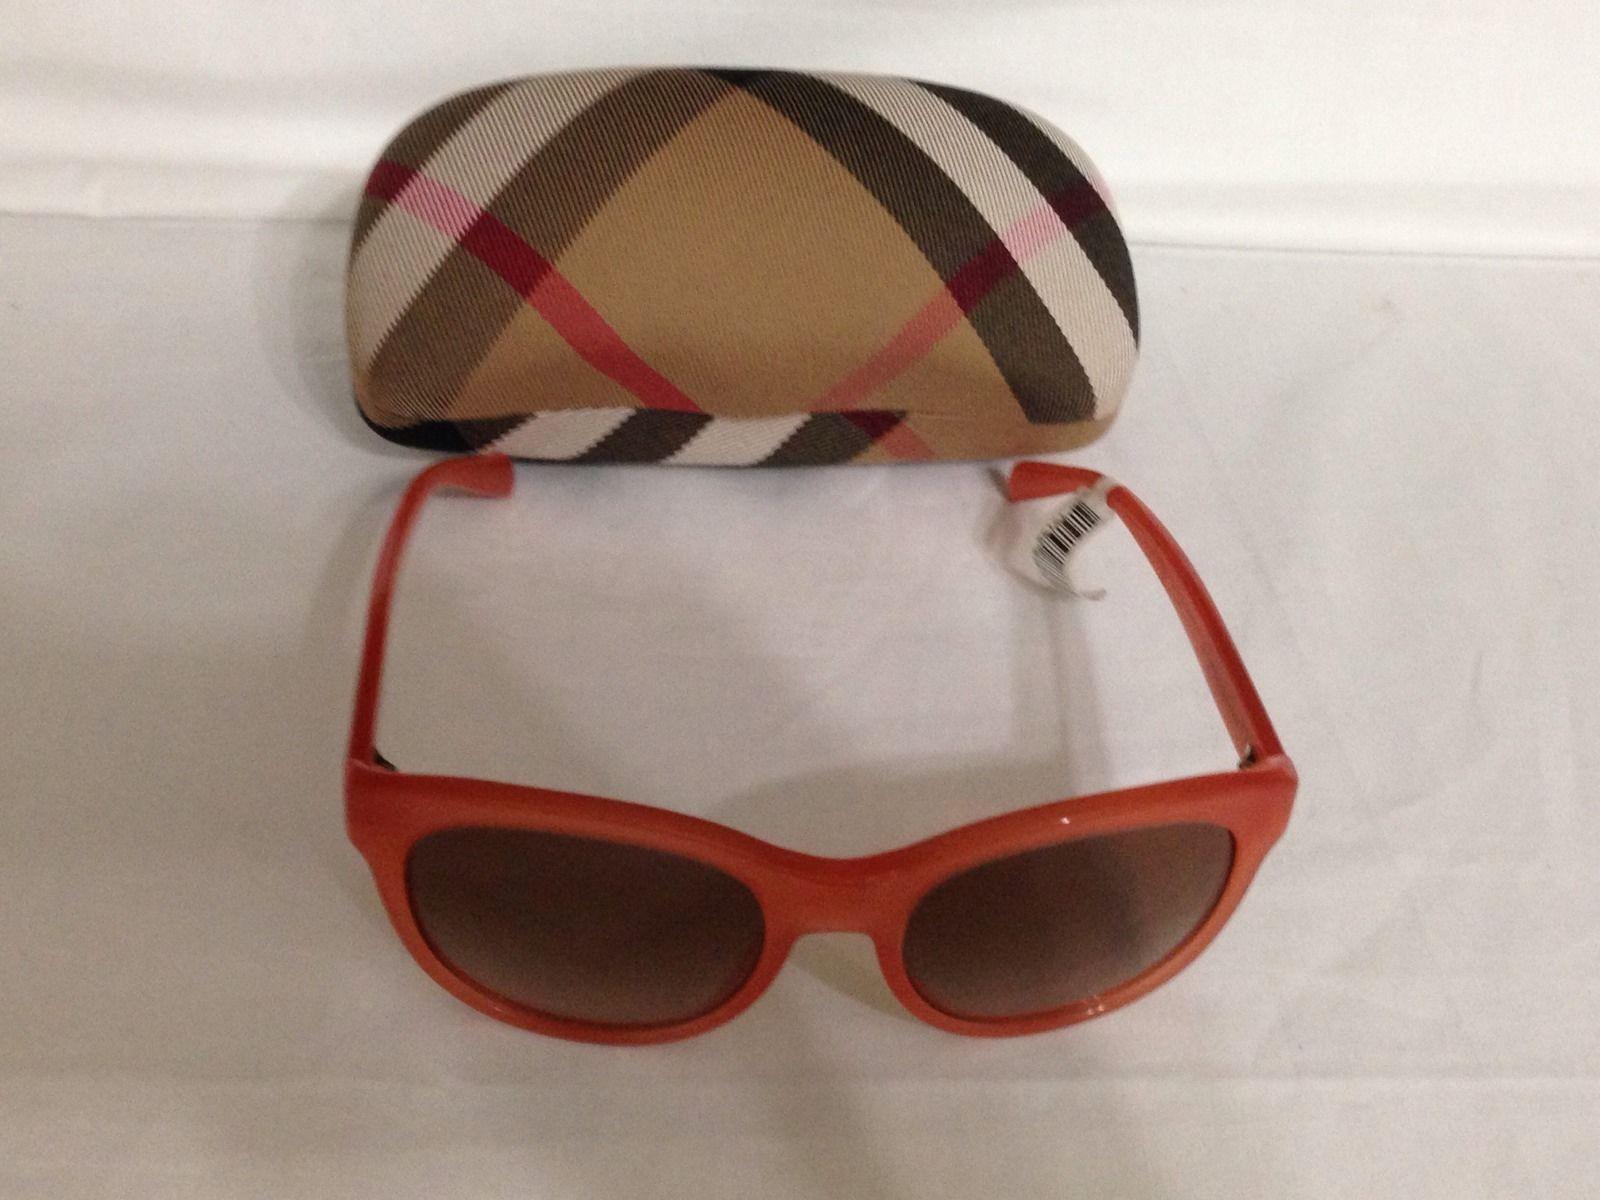 8bc41ff15c65 NWT! Burberry B 4132 Sunglasses. 100% and 50 similar items